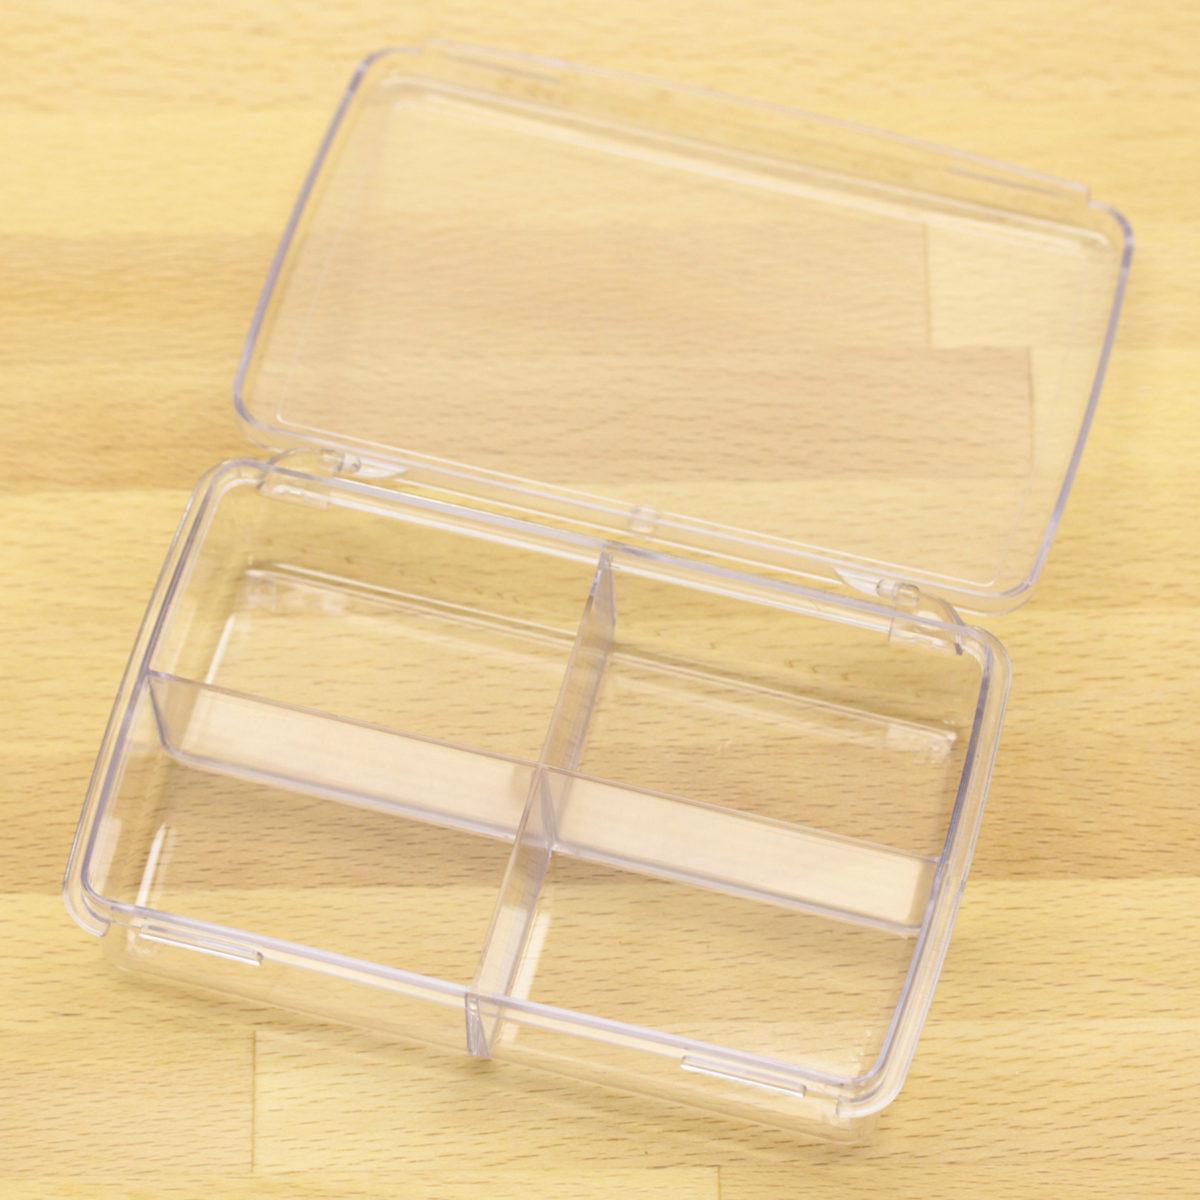 plastic box w 4 comp 2